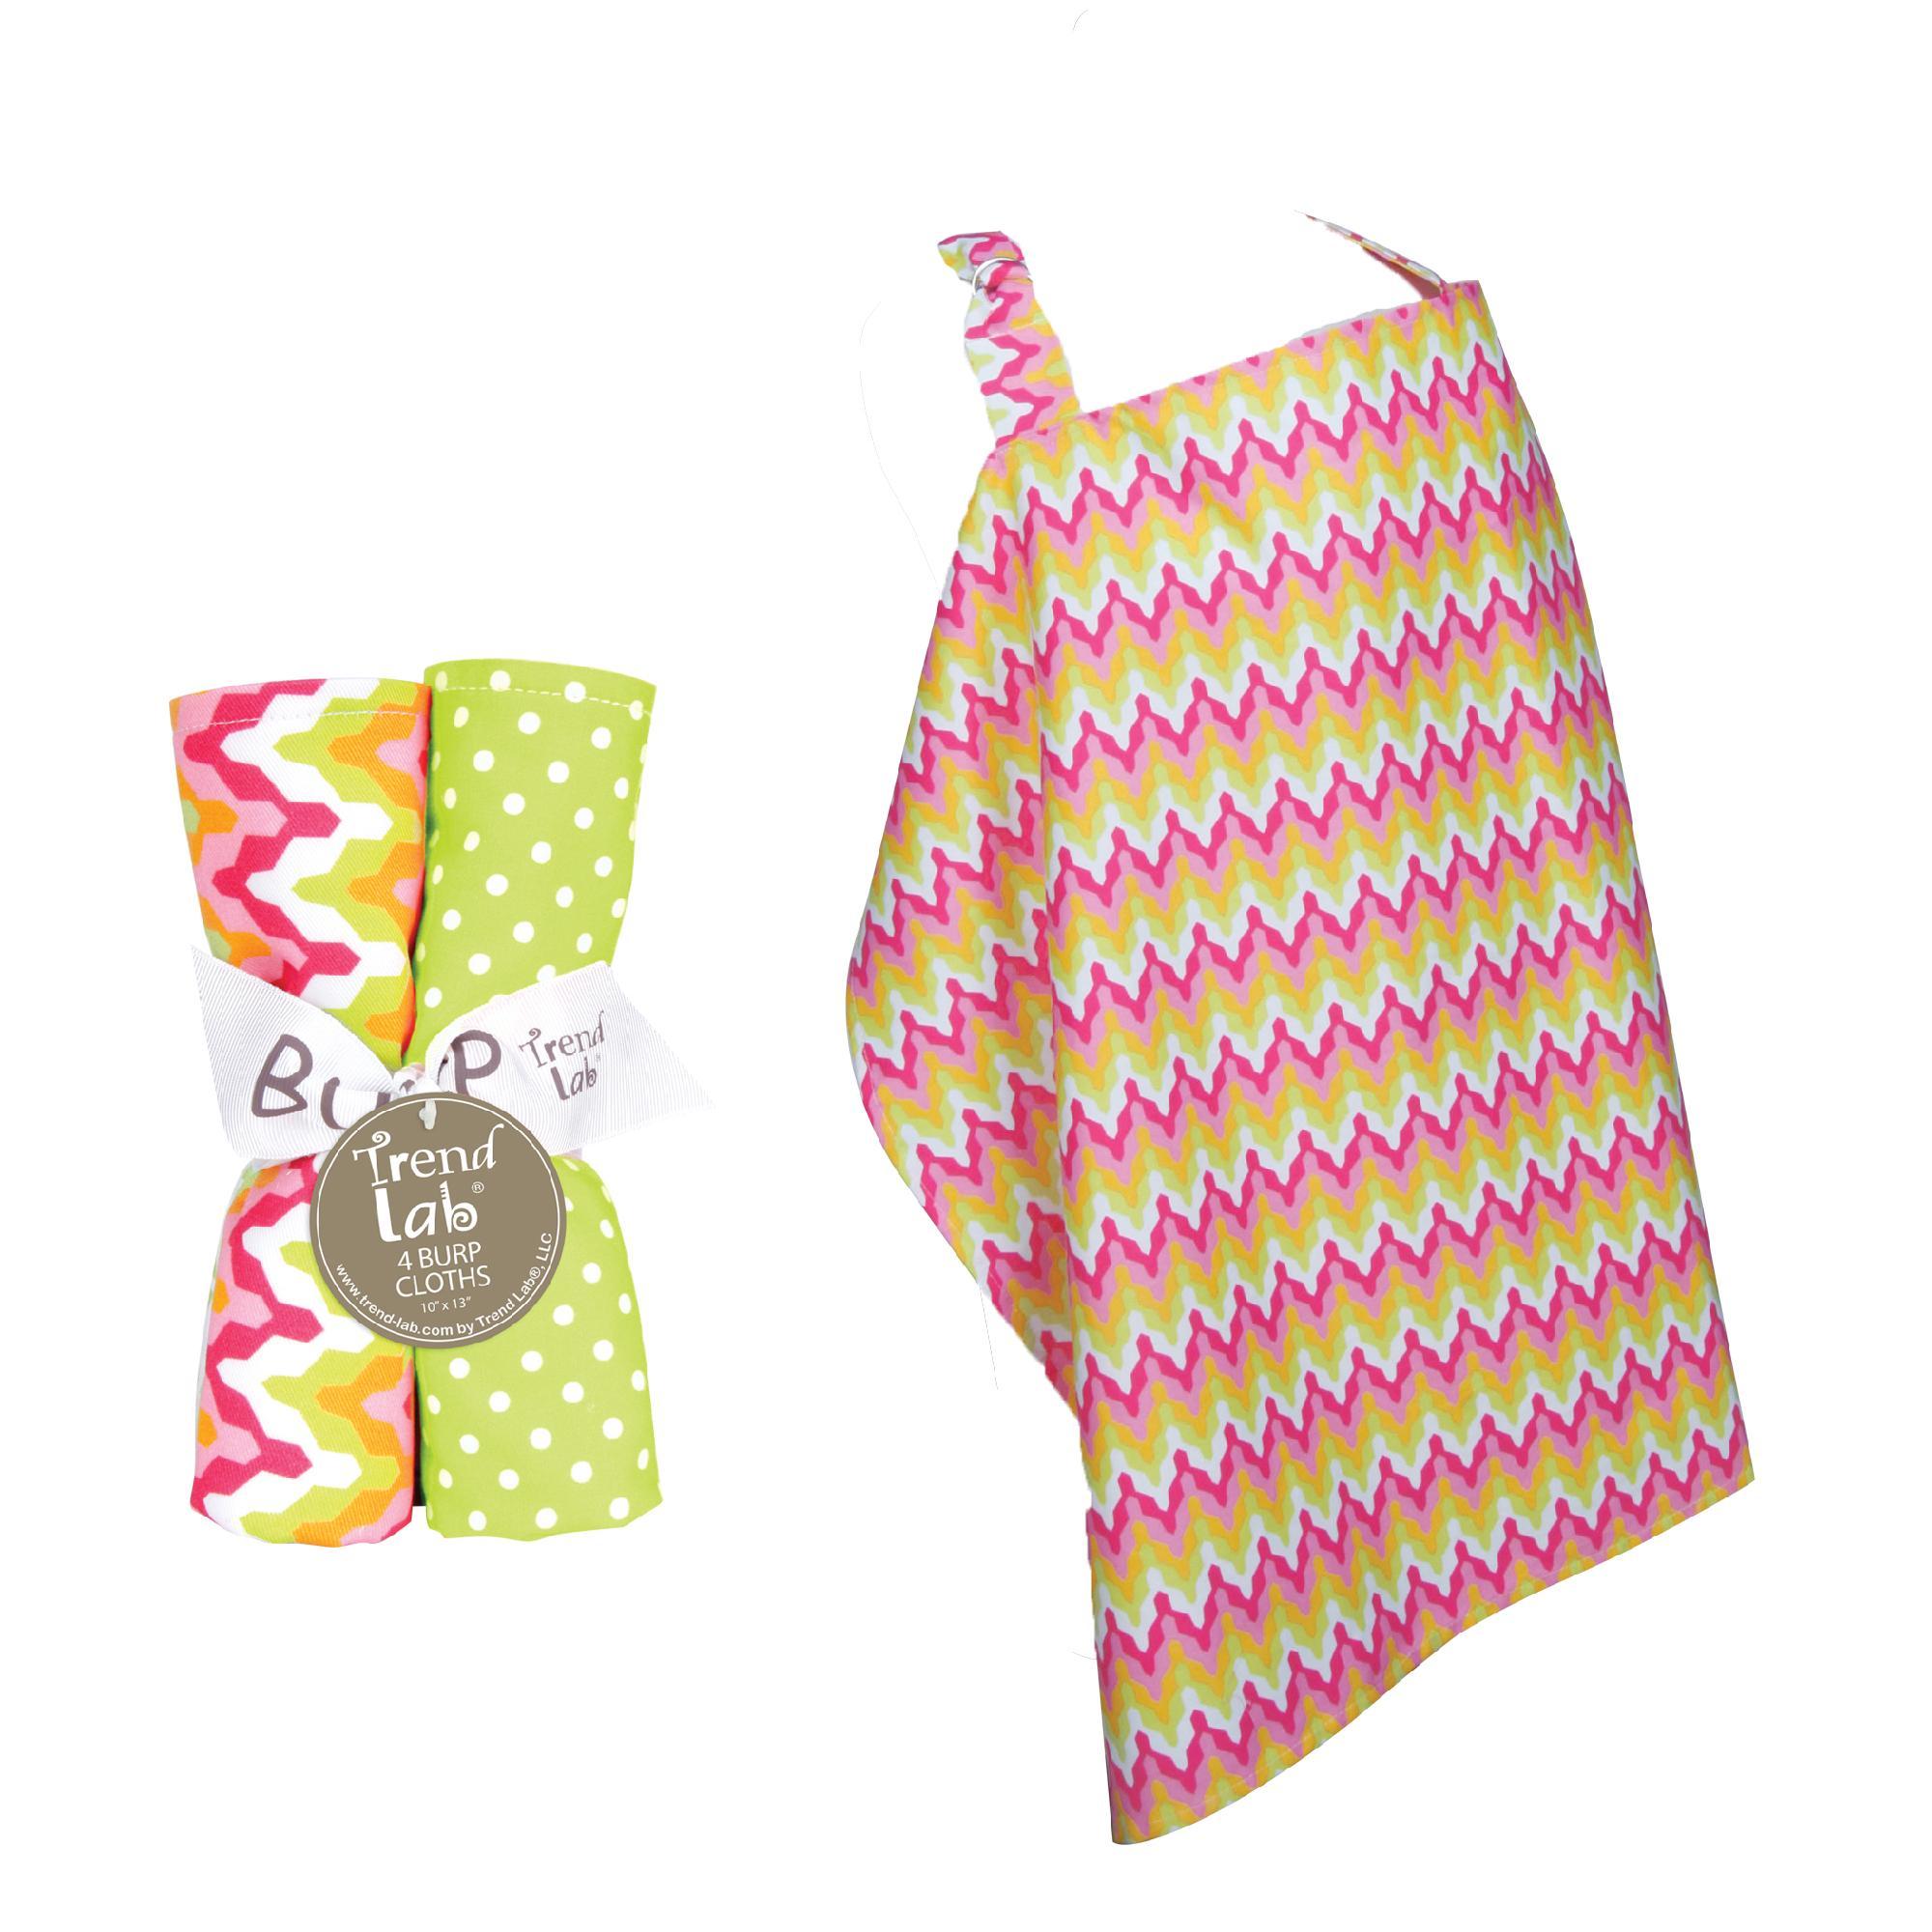 Trend Lab NURSING COVER AND BURP CLOTH SET SAVANNAH Baby